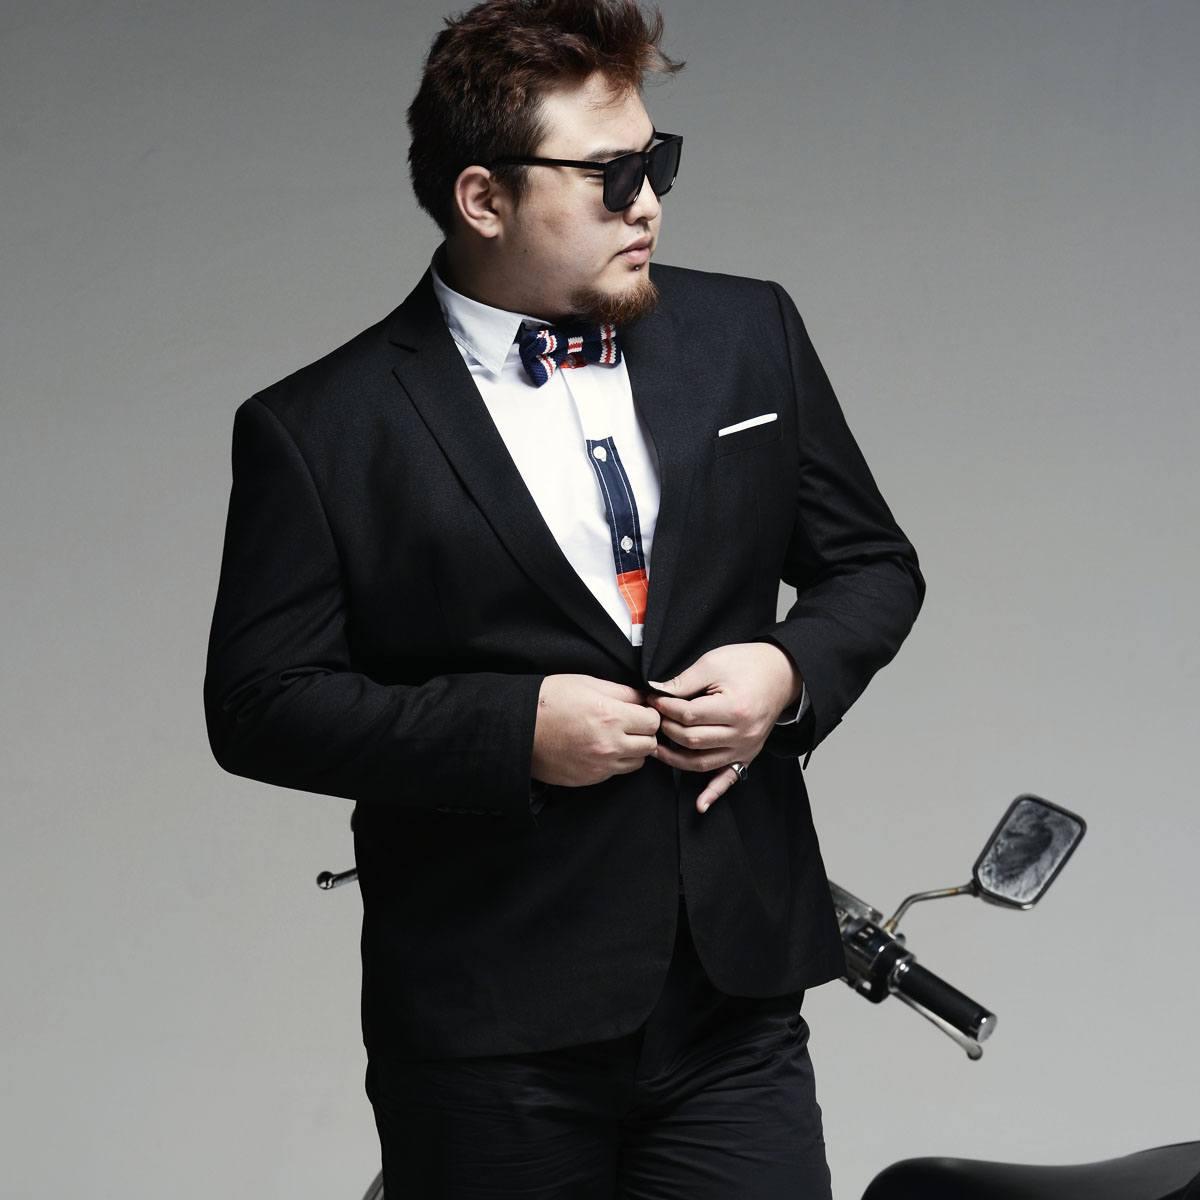 Ropa De Moda Para Gordos Gorditos Hombres Verano 2015 Blazer Modaellos Com